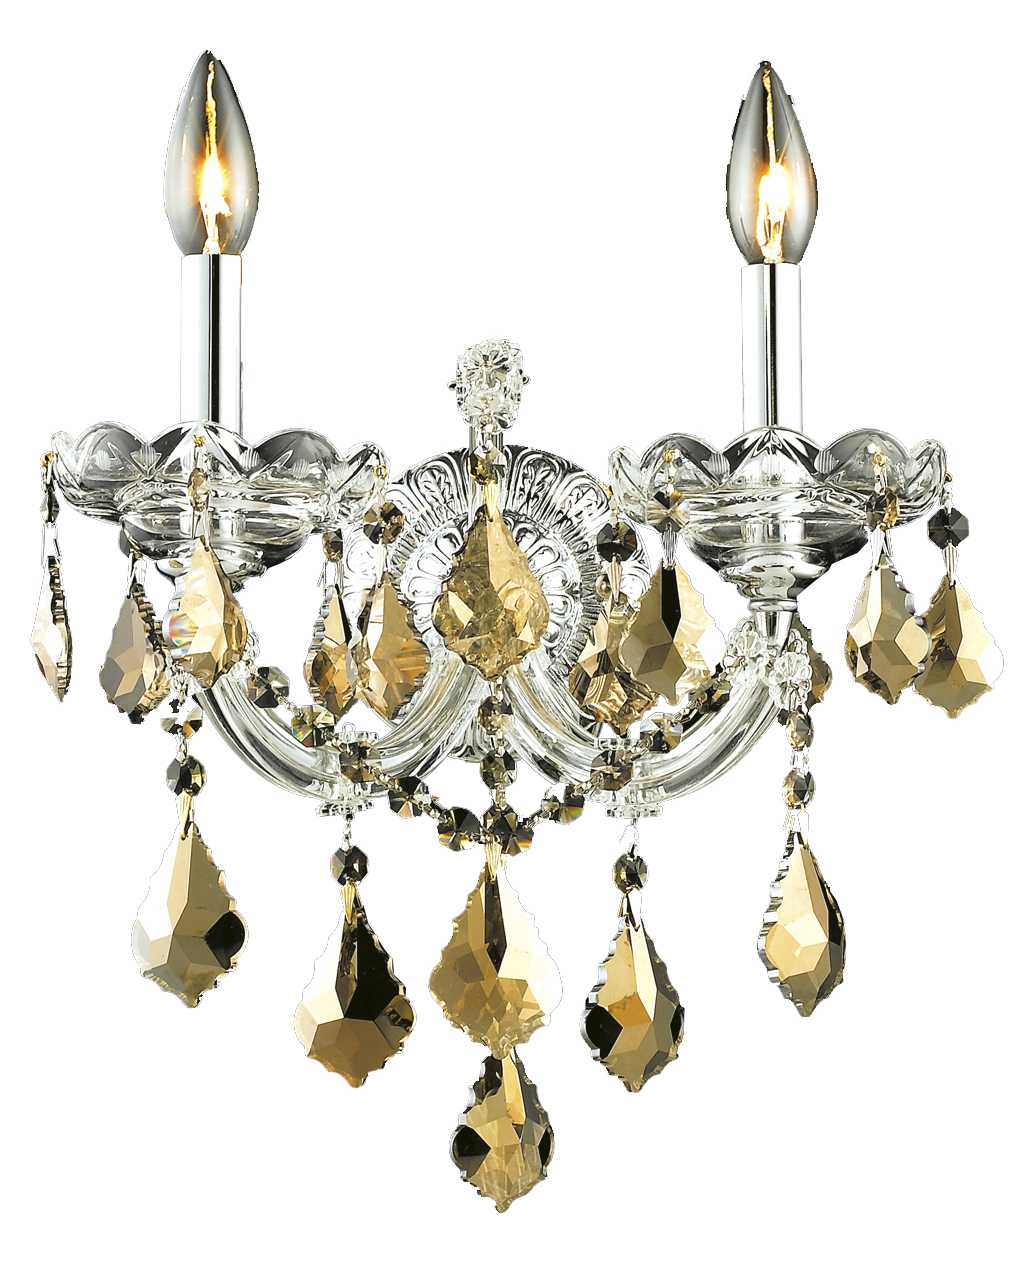 Elegant Lighting Wall Sconces : Elegant Lighting Royal Cut Smoky Golden Teak Crystal Maria Theresa 2-Light Crystal Wall Sconce ...